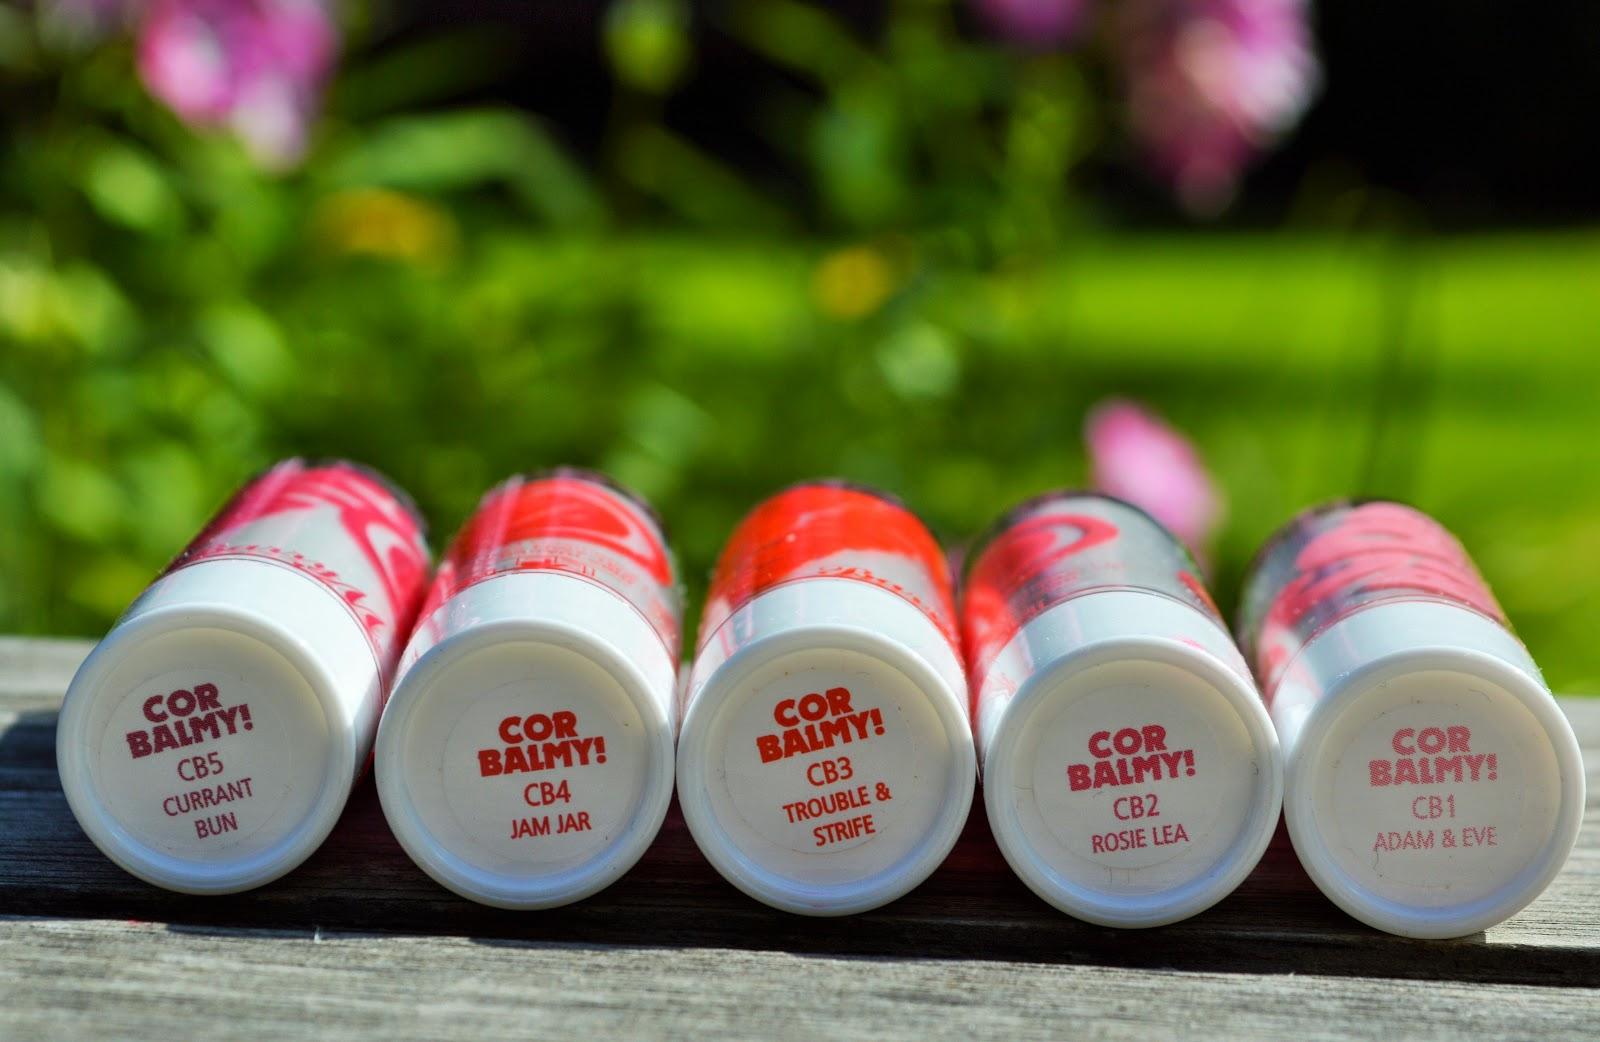 Barry M Cor Balmy Tinted Lip Balms